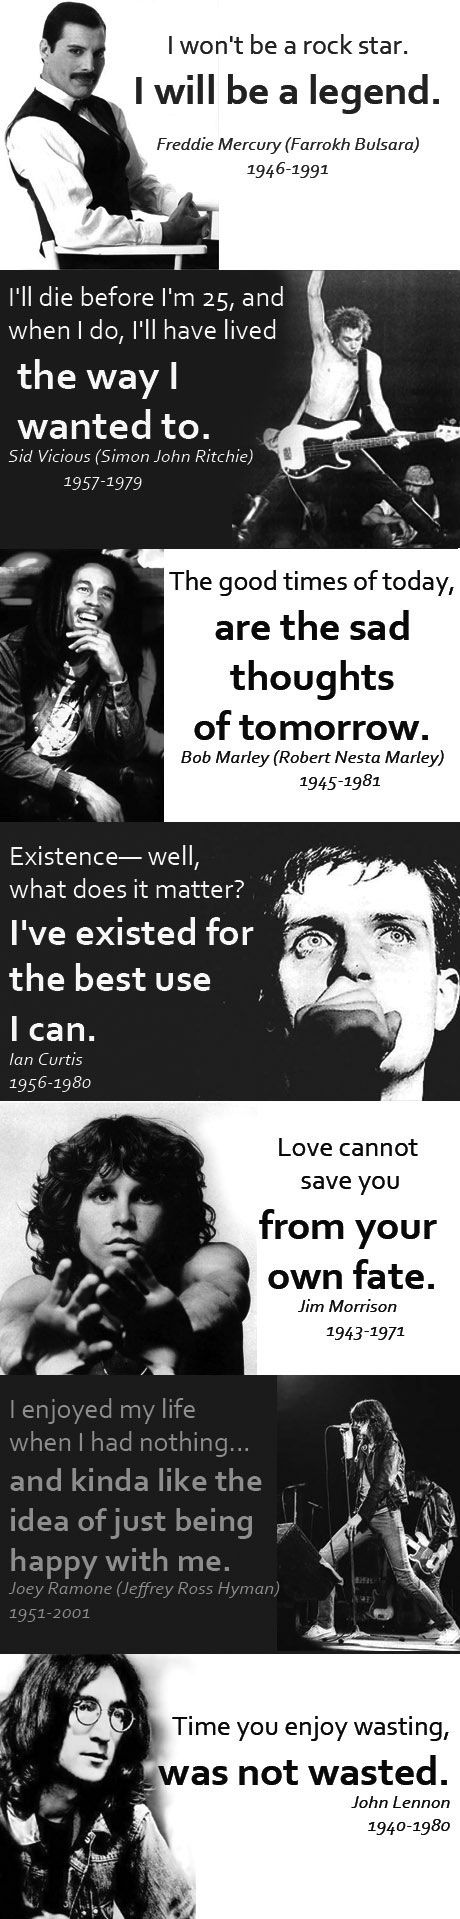 Rock legends' quotes